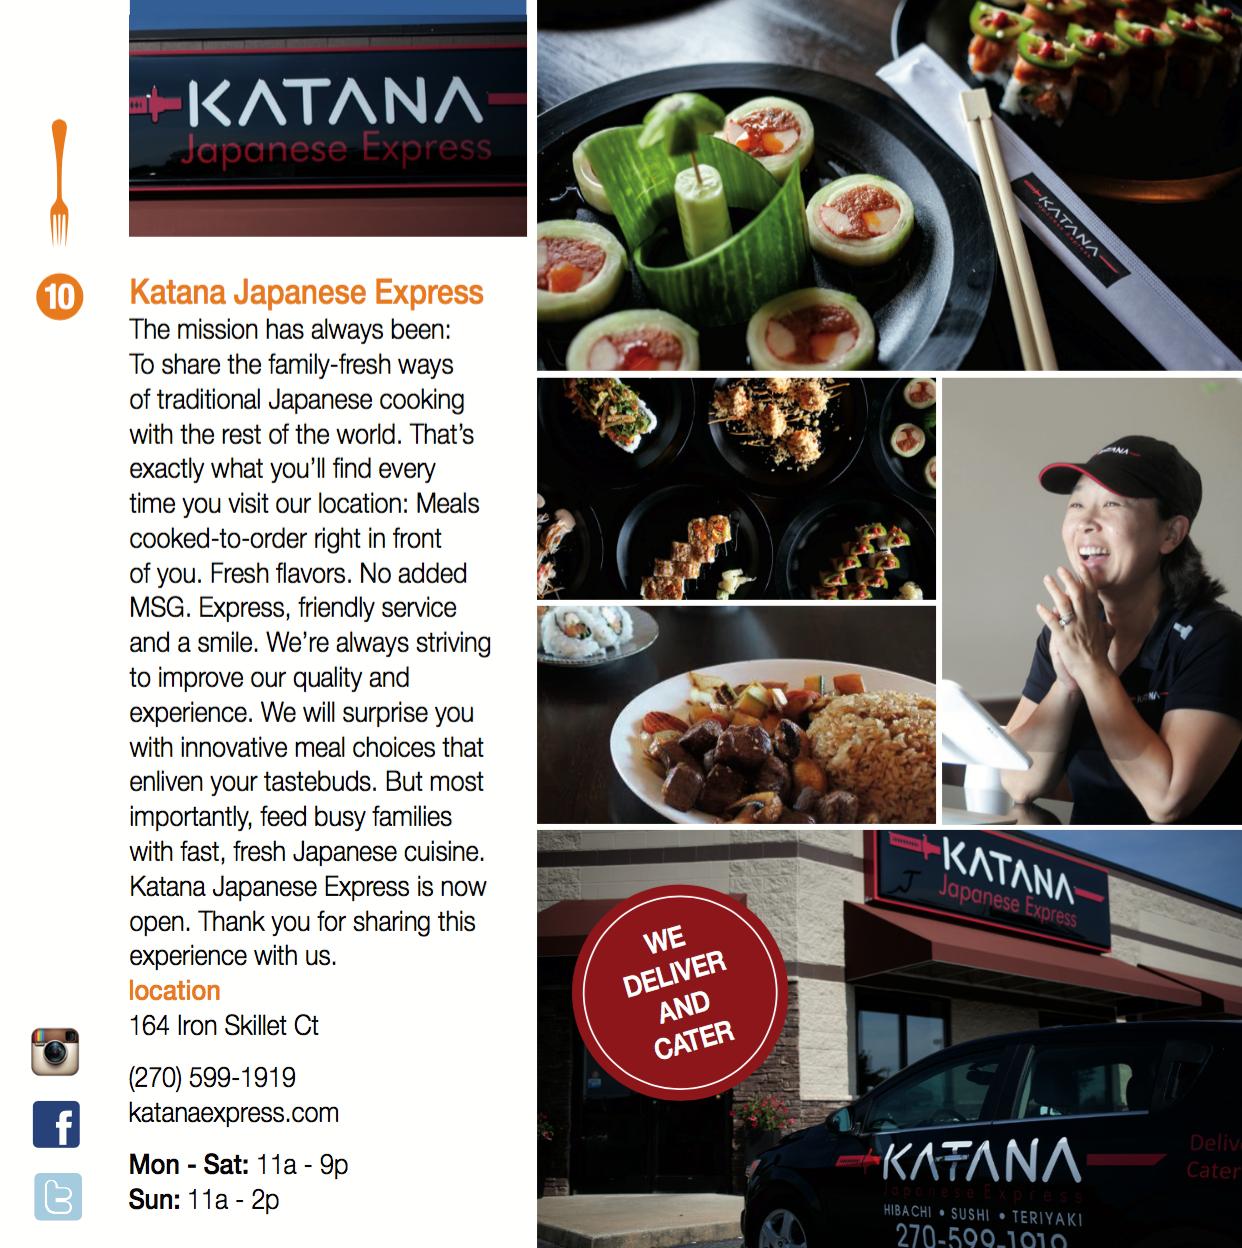 Katana Japanese Express